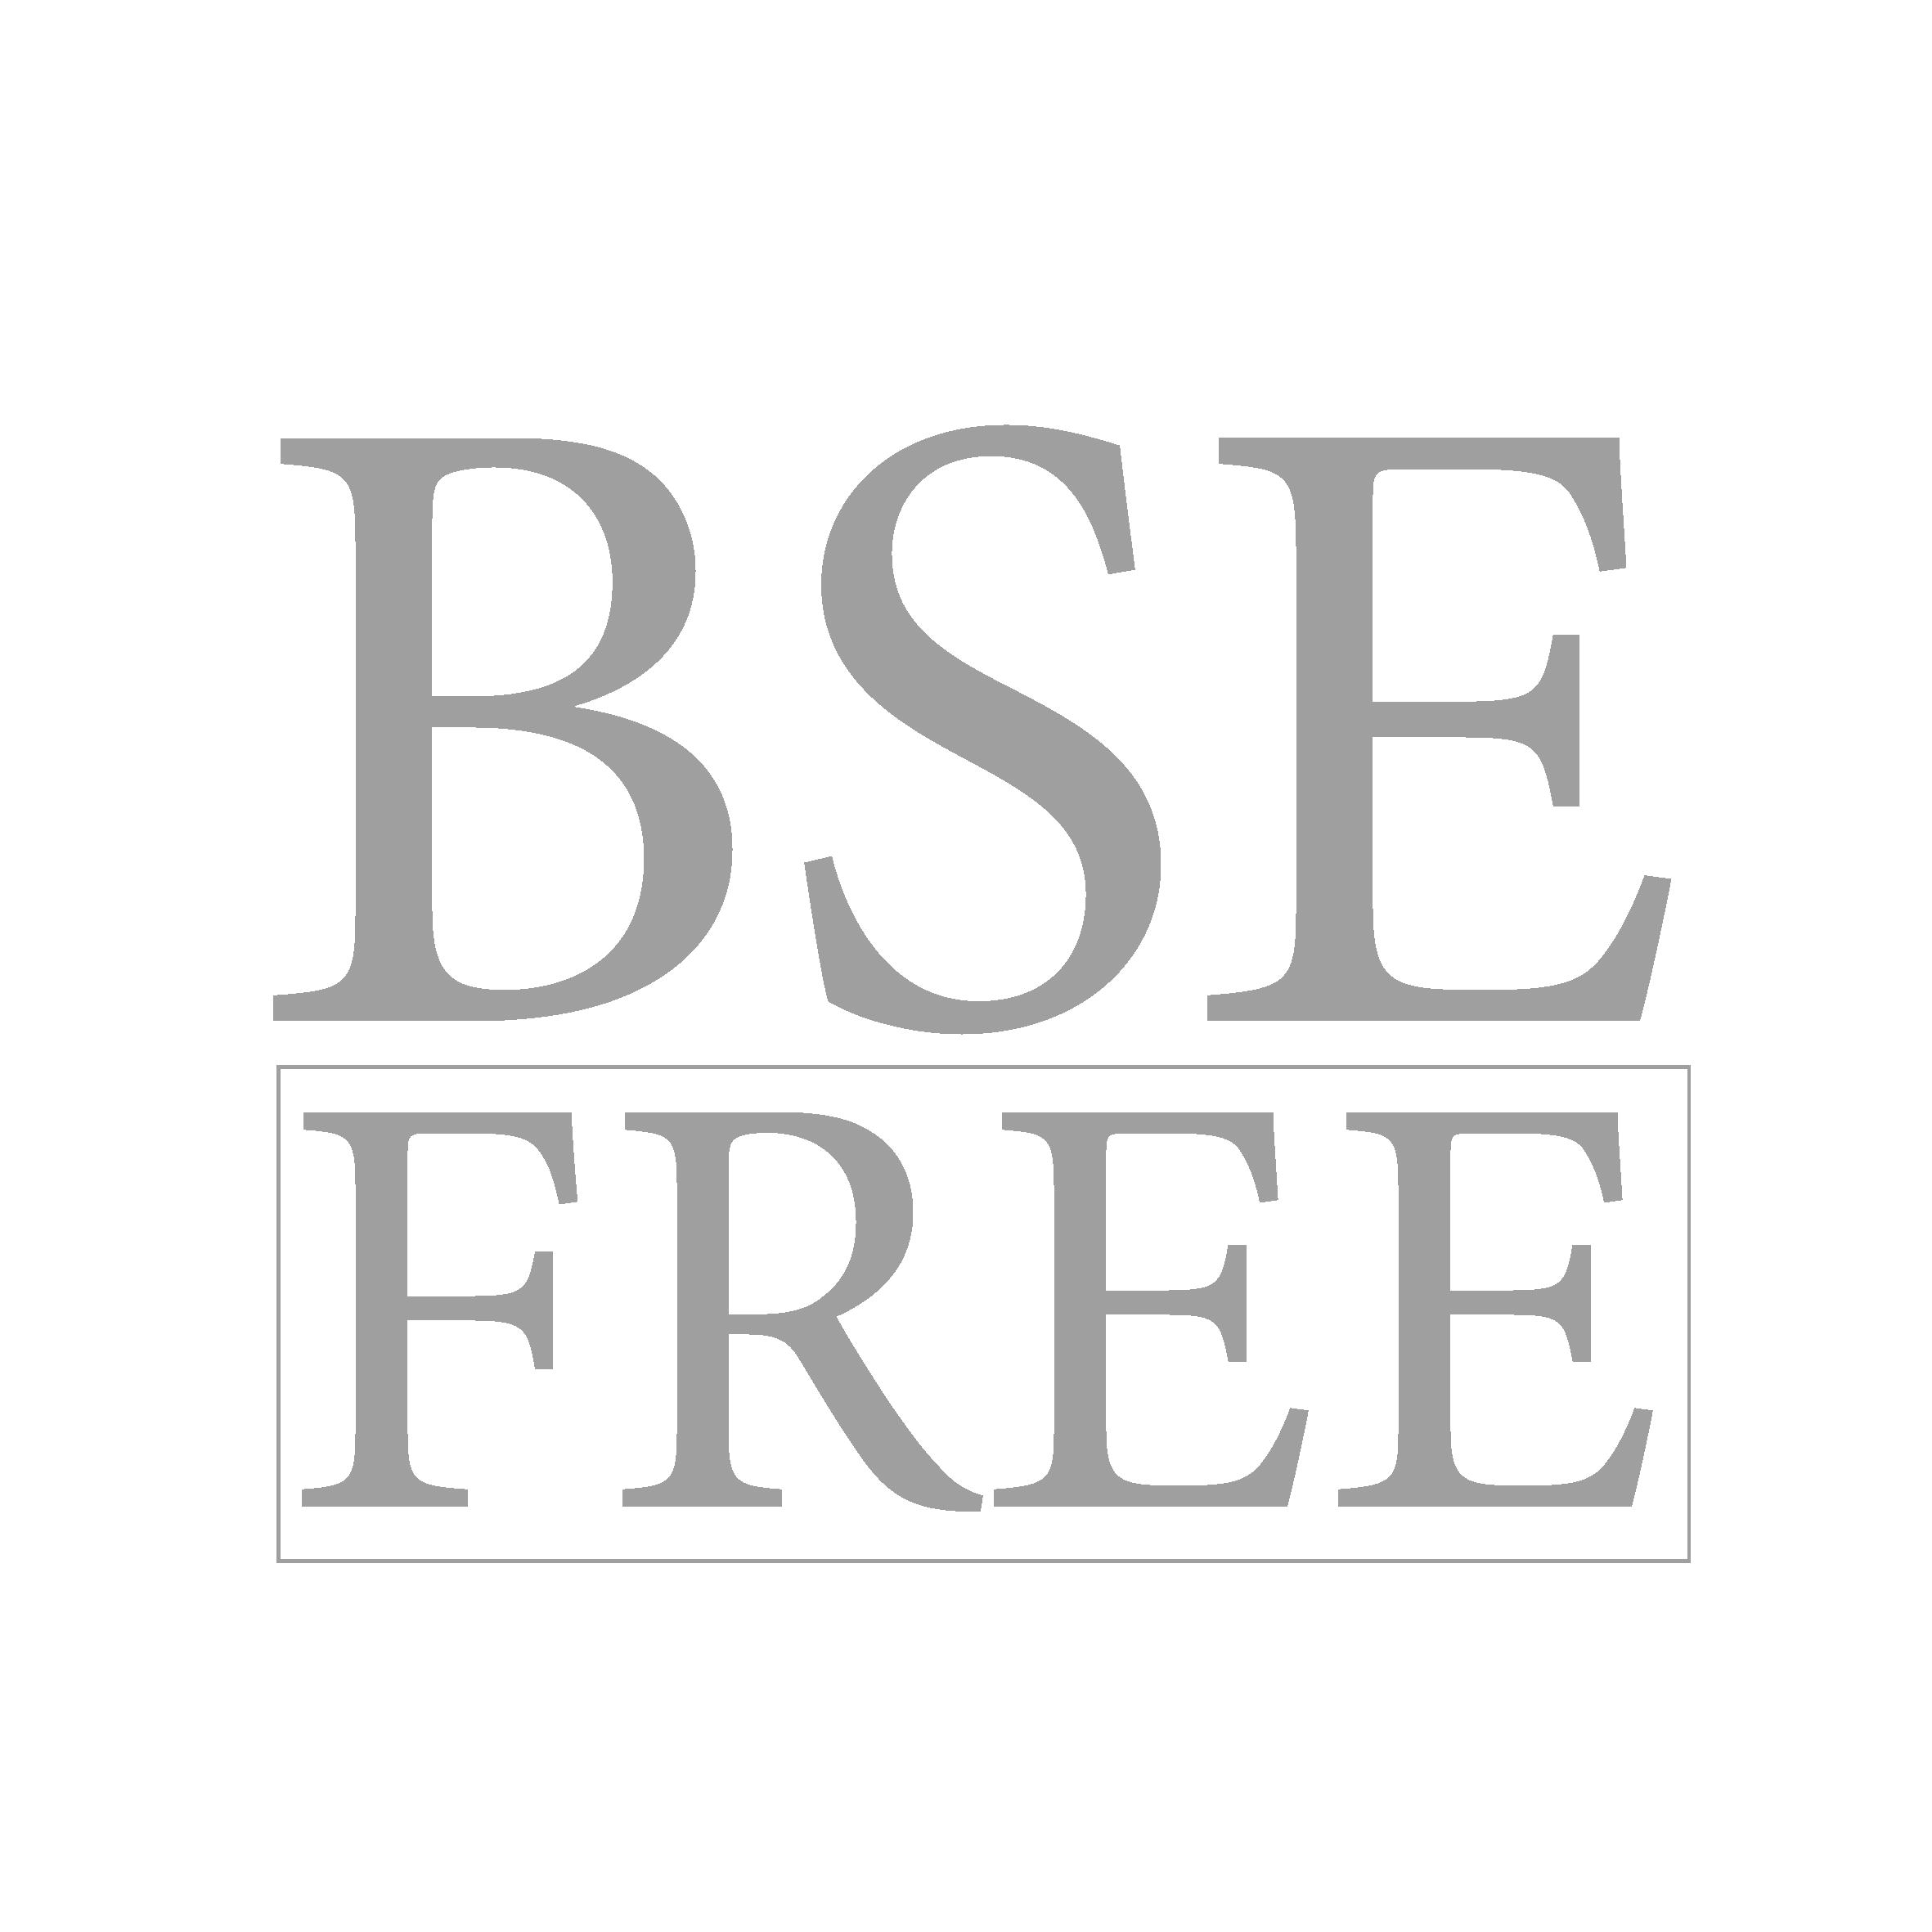 Galena - Selo bse free